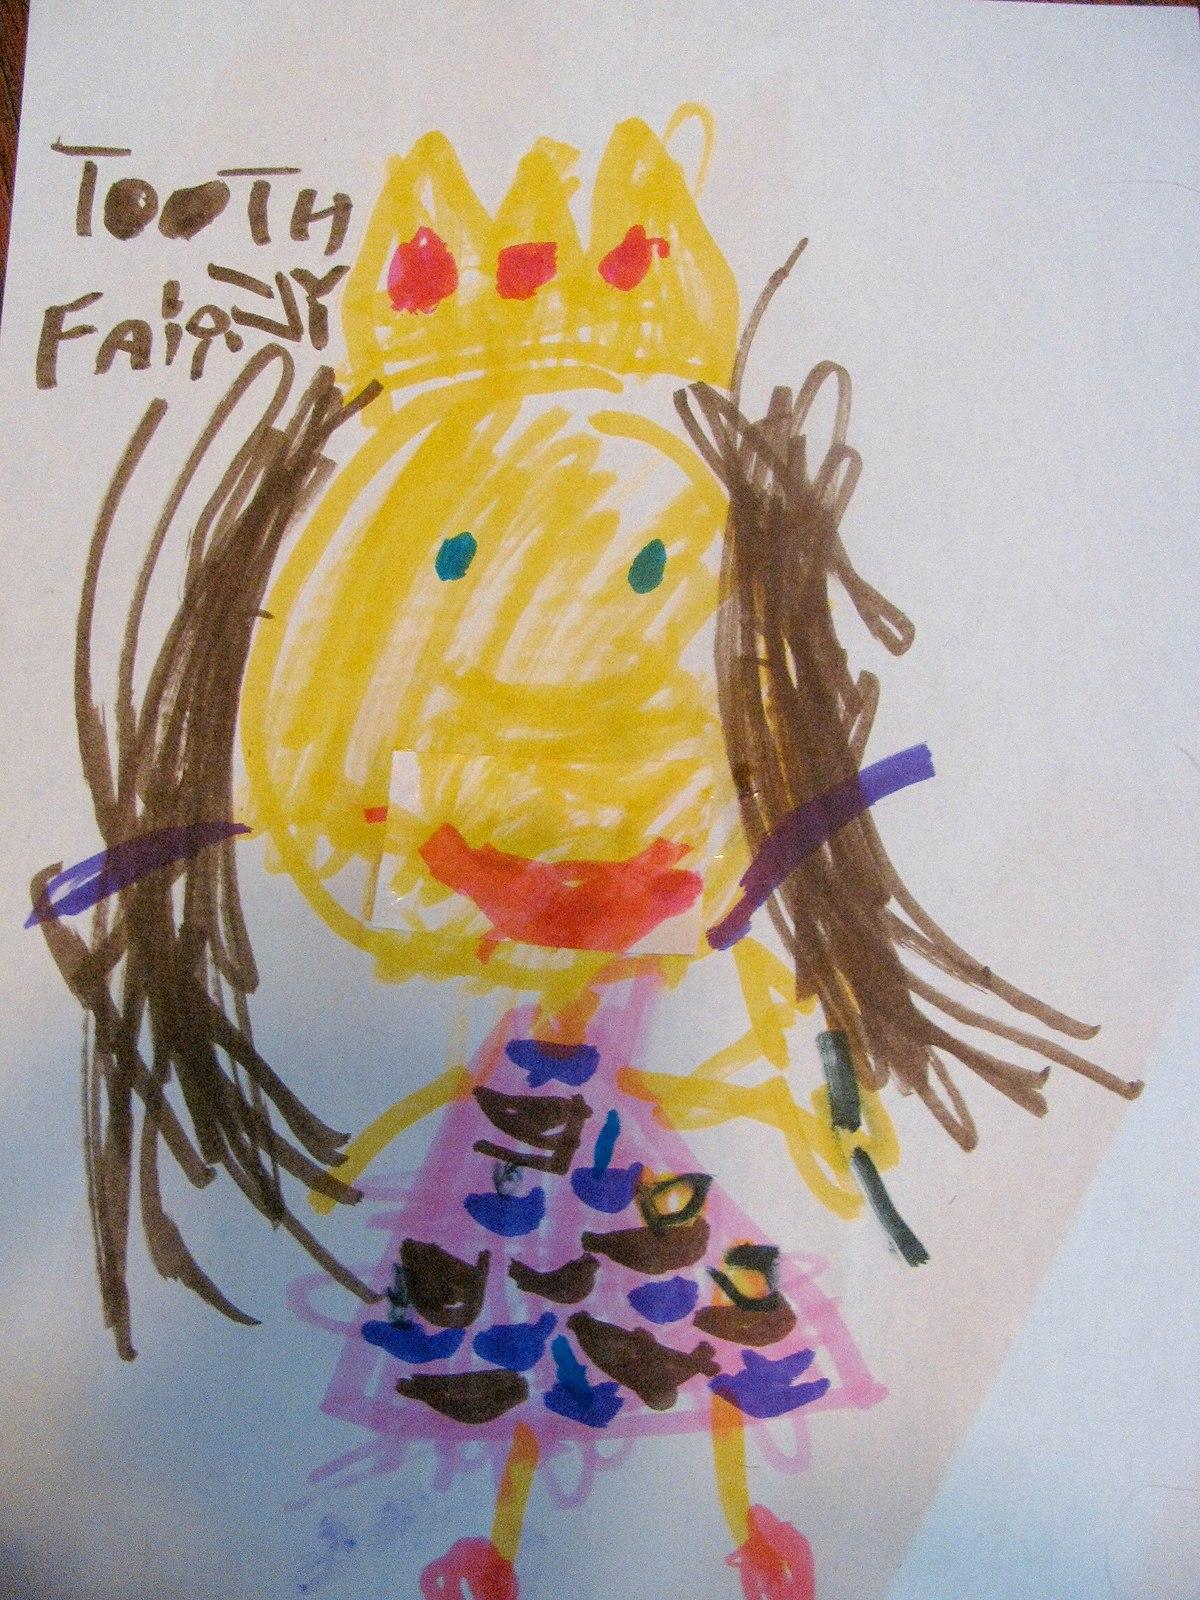 Peri Gigi / Tooth Fairy